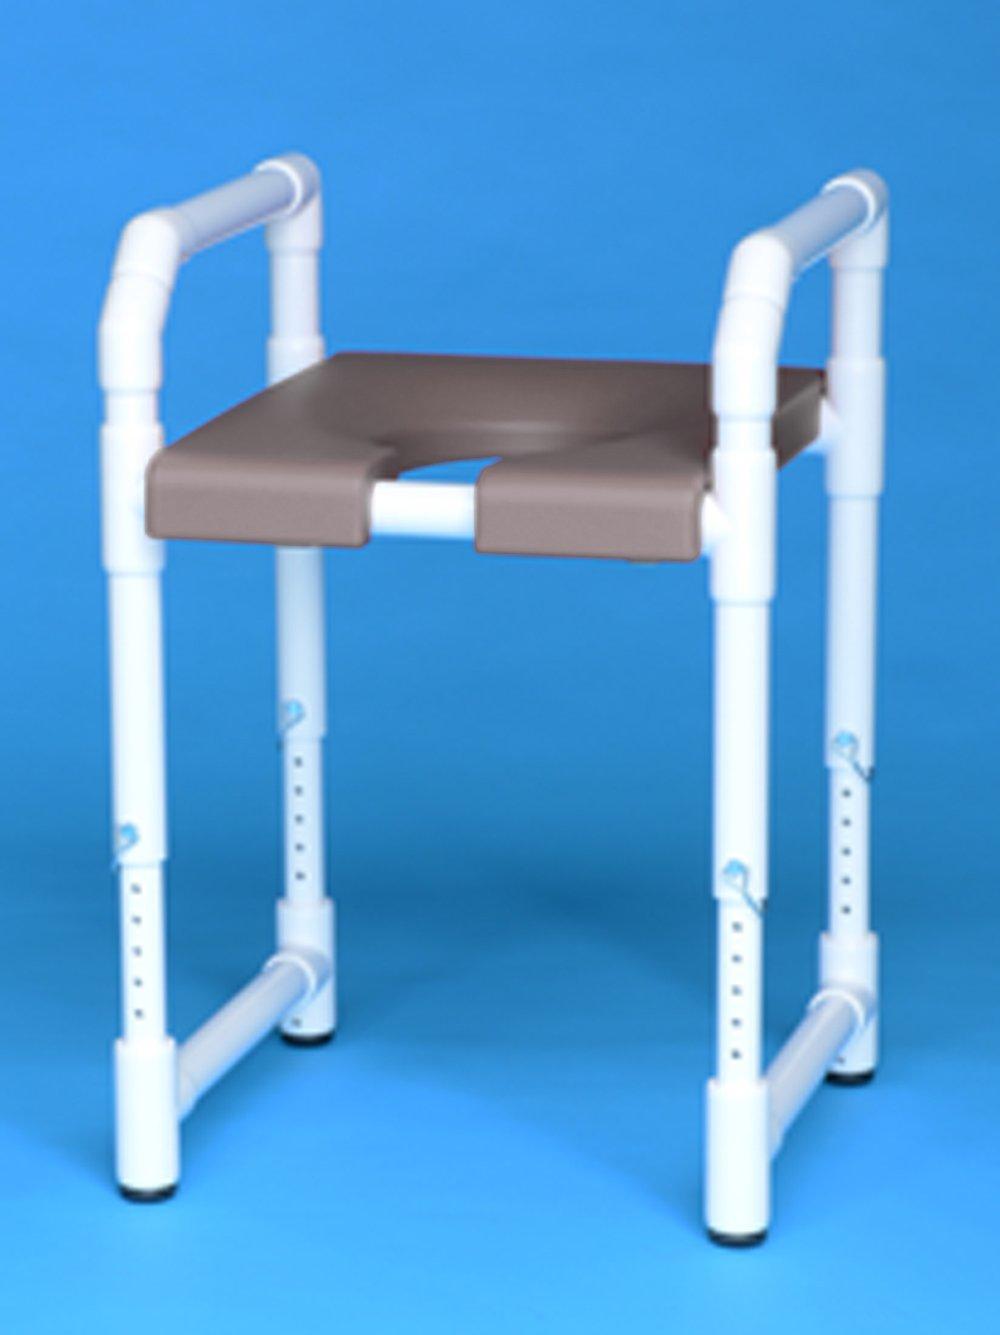 Toilet Safety Frame IPU TSF12 B/G/R (Gray) by IPU